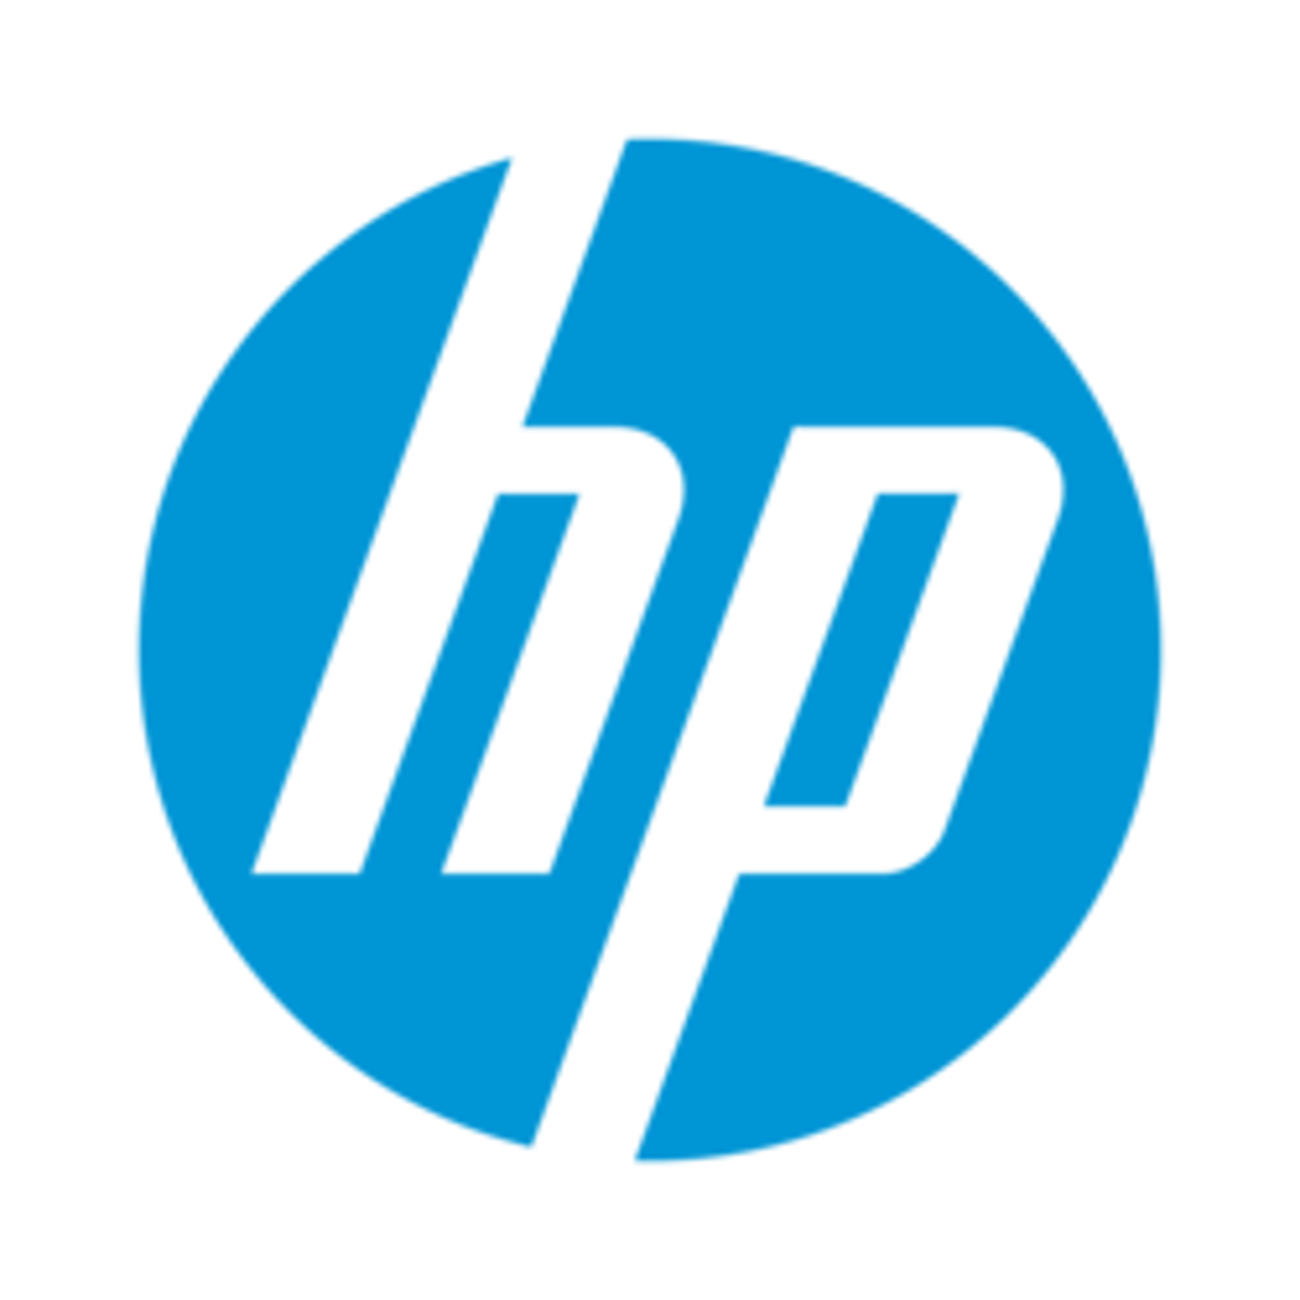 HPE StoreEver LTO-7 Tape Drive - 6 TB (Native)/15 TB (Compressed)